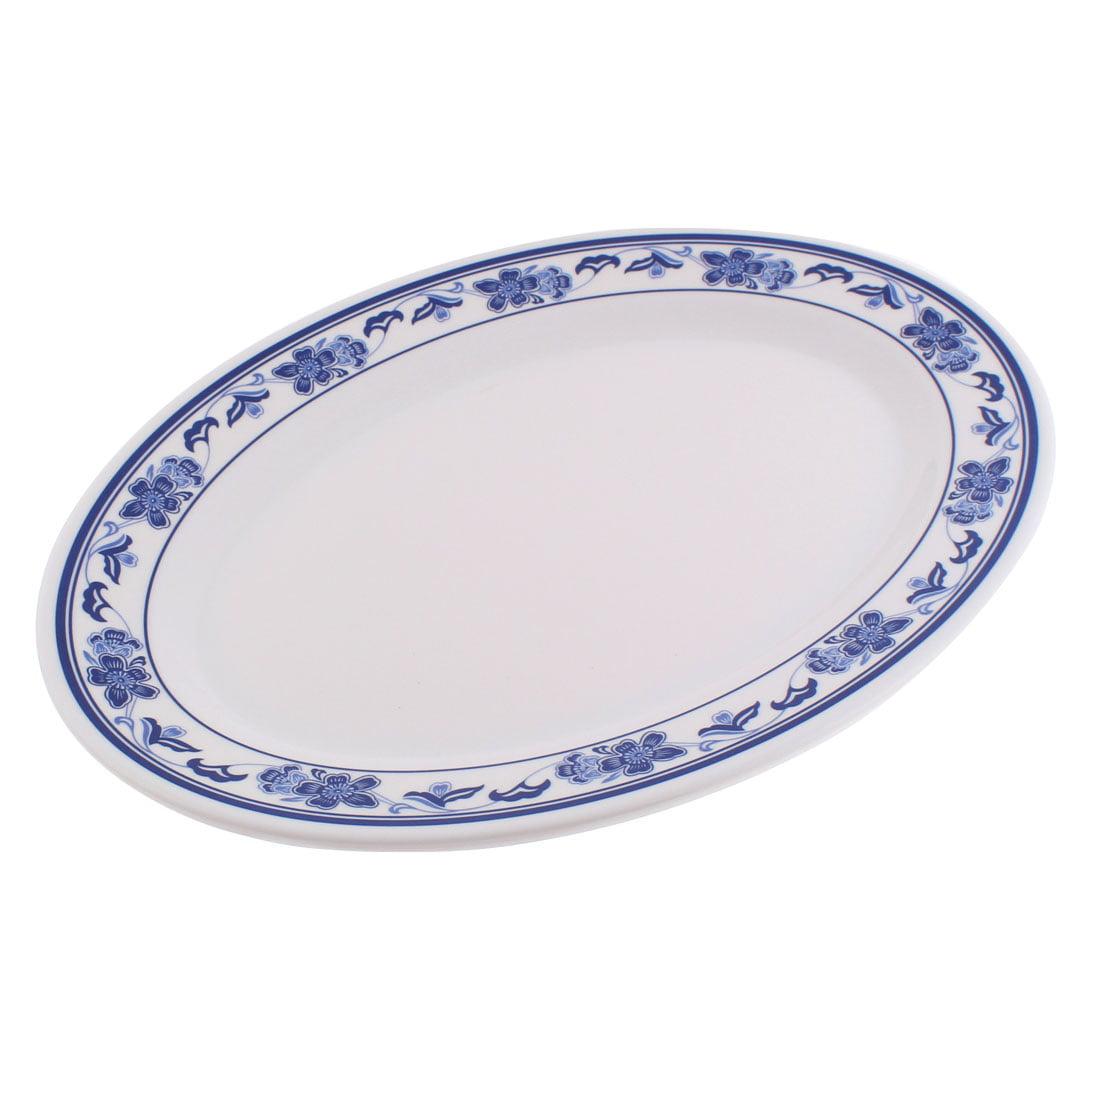 Restaurant Plastic Oval Shaped Flower Print Vegetable Food Dessert Dish Plate by